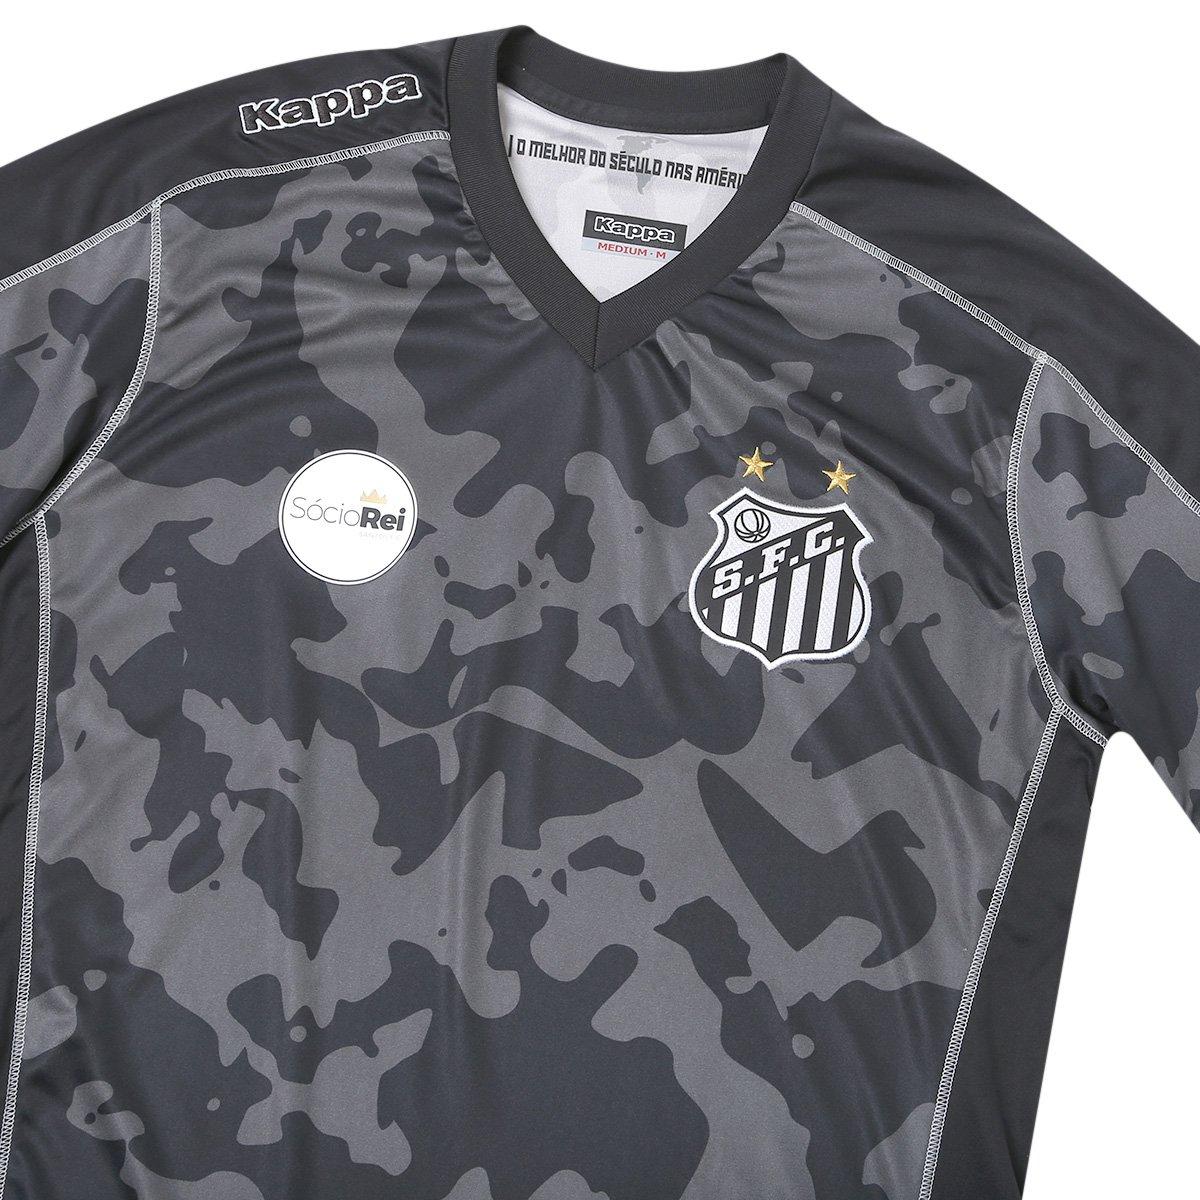 Camisa Santos III 17 18 s n° - Torcedor Kappa Masculina - Preto ... a93a66c8e900e